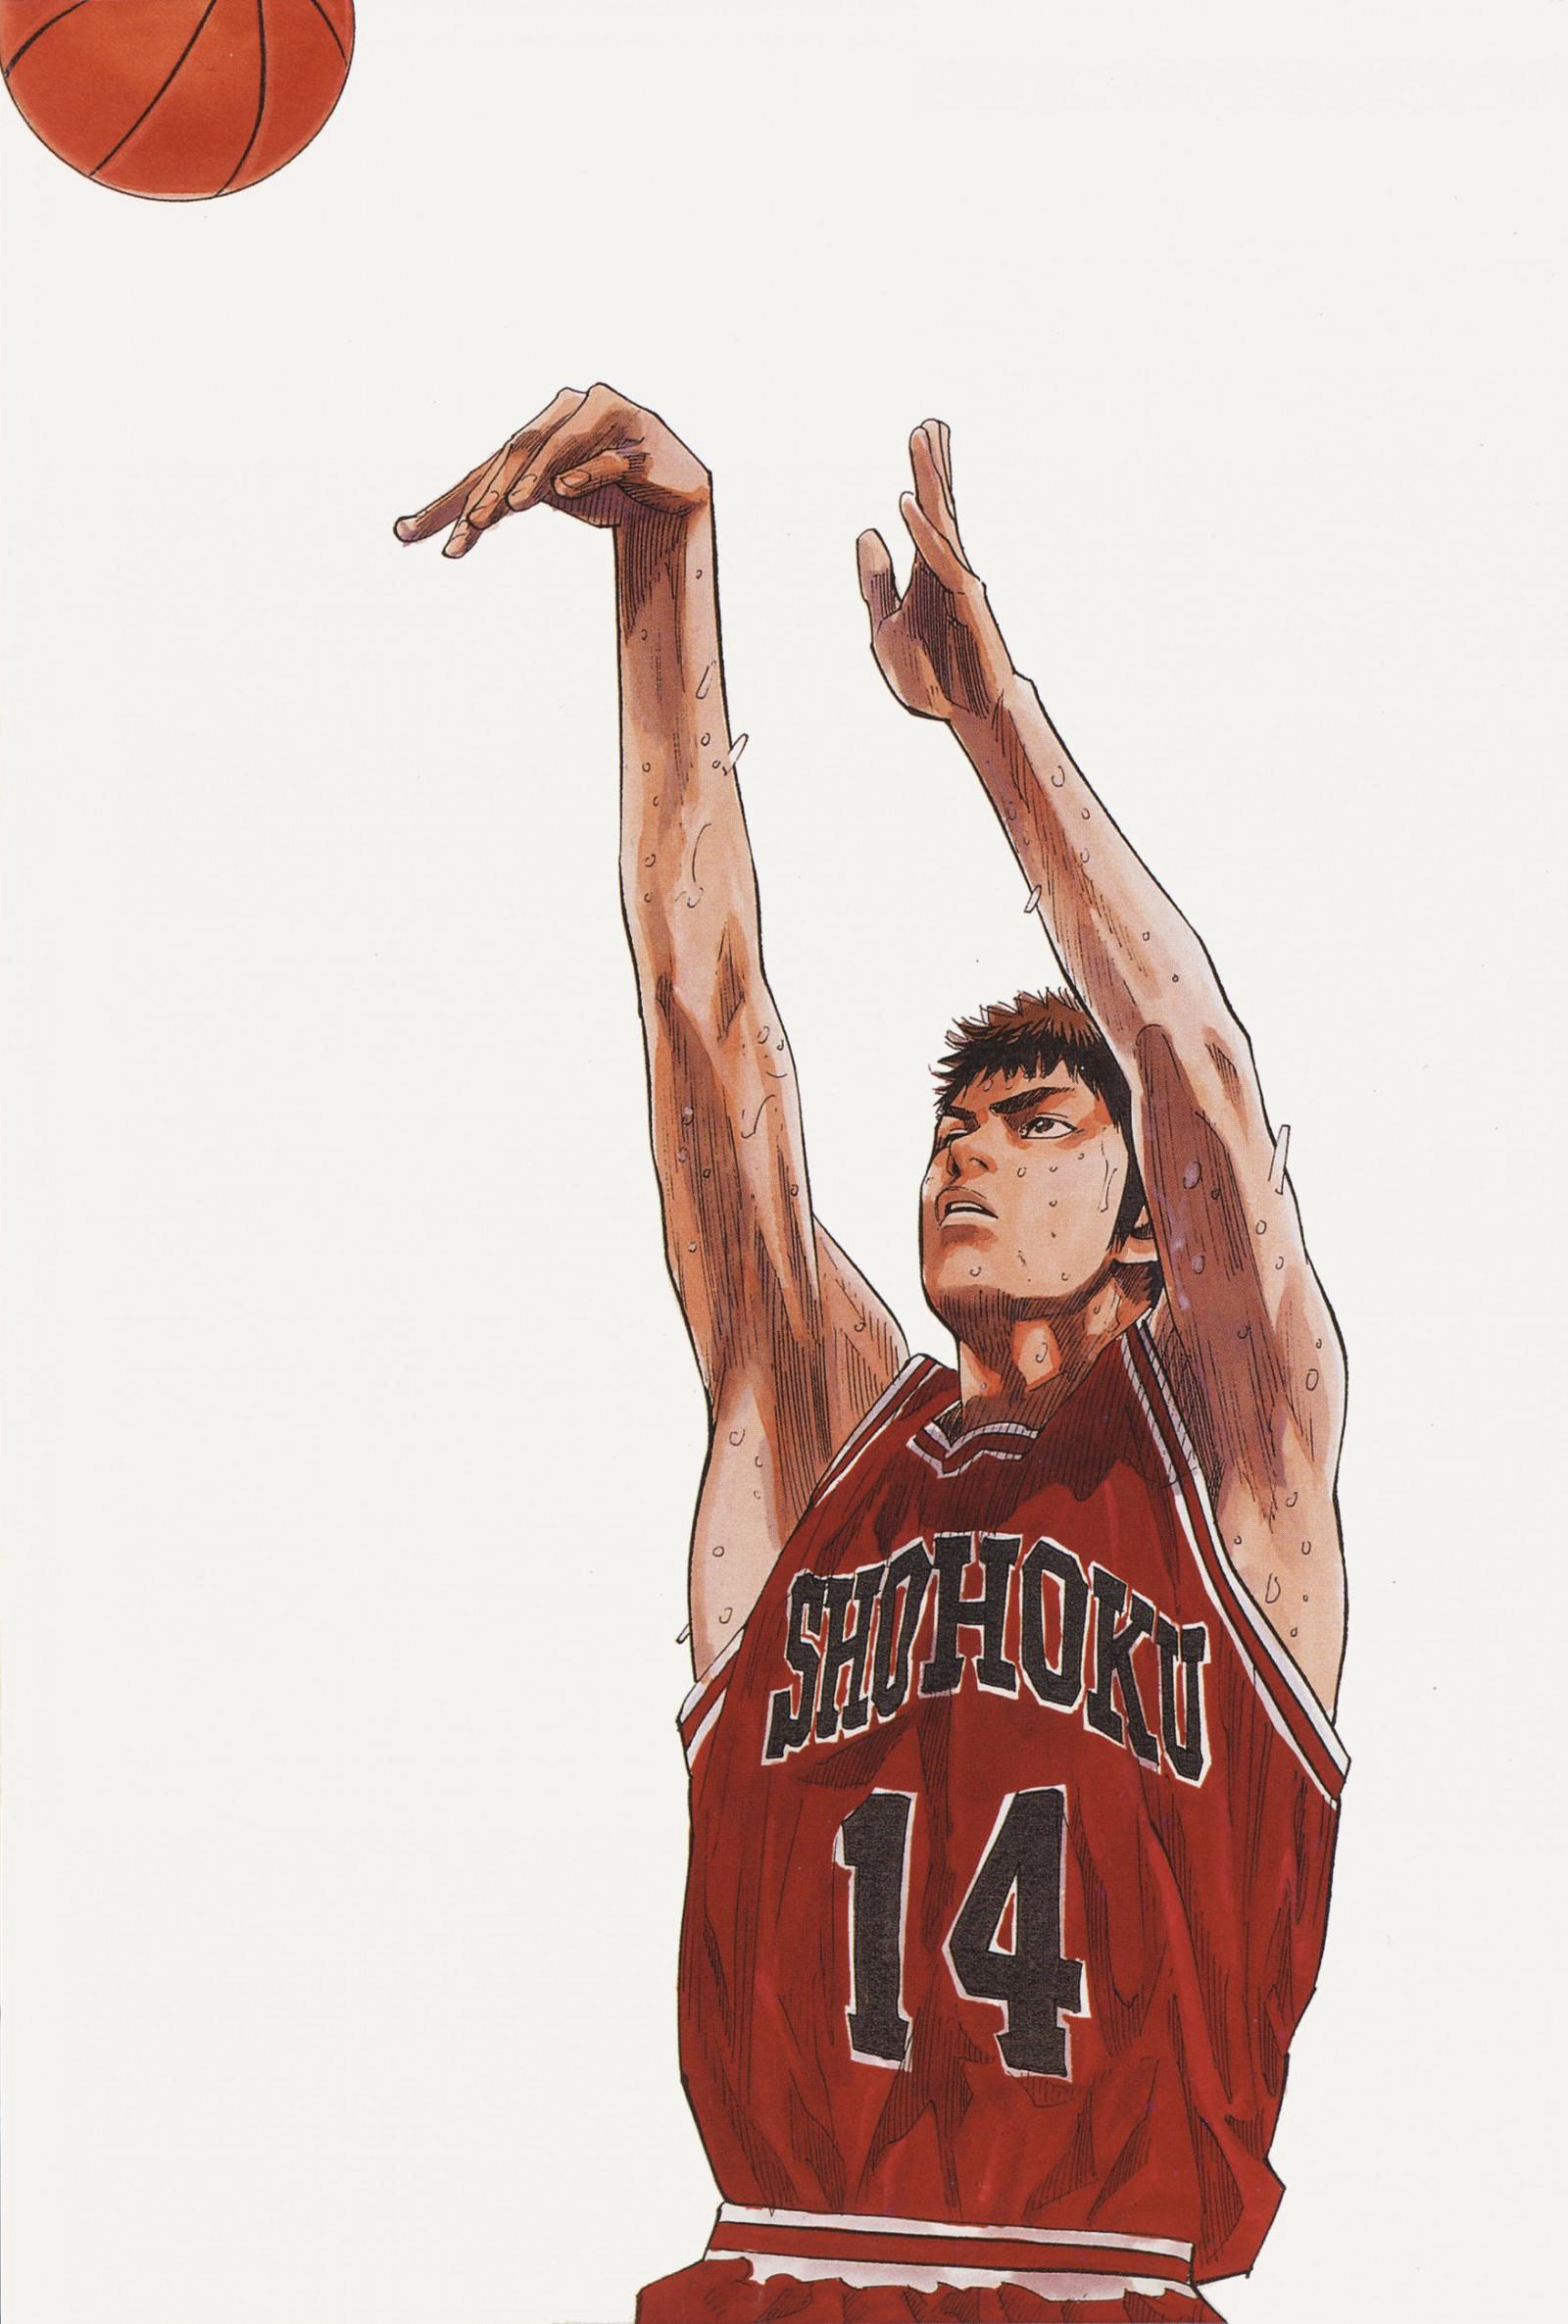 1754x2600 px аниме баскетбол персонаж замочить Парень Hisashi Mitsui серии Хлопать виды спорта